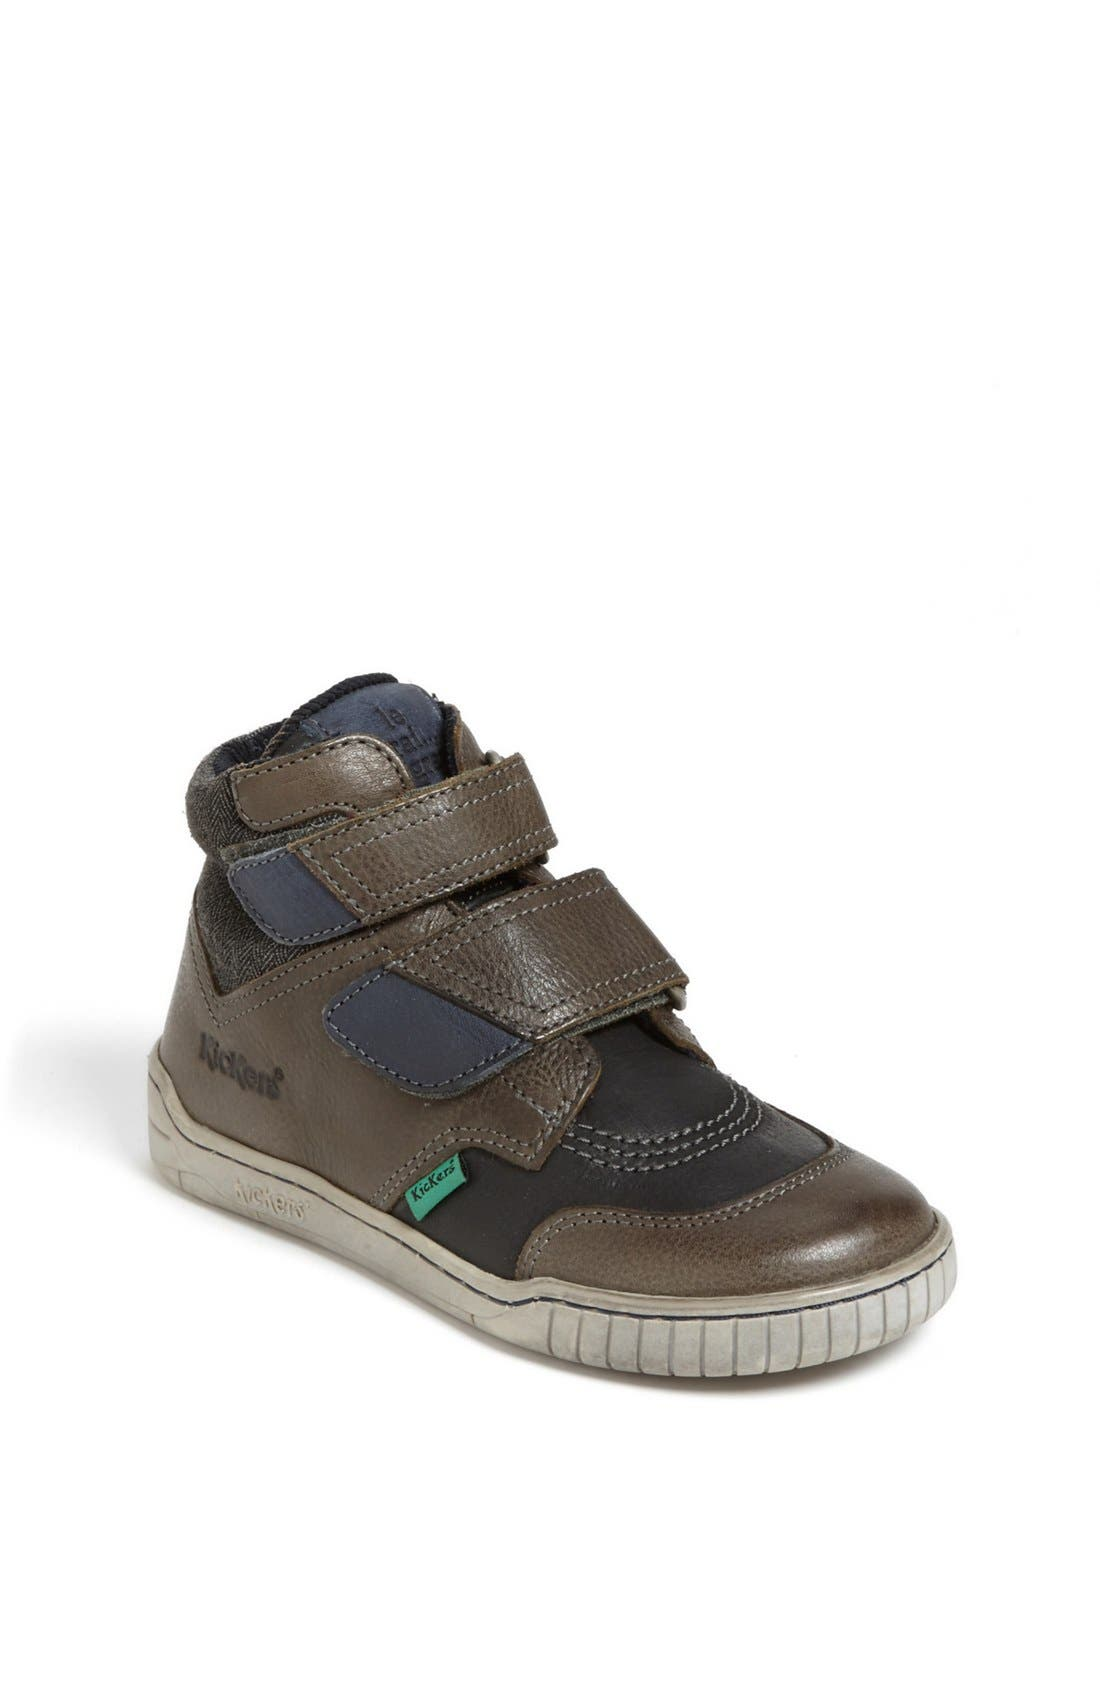 Alternate Image 1 Selected - Kickers 'Windsor 4' Sneaker (Toddler & Little Kid)